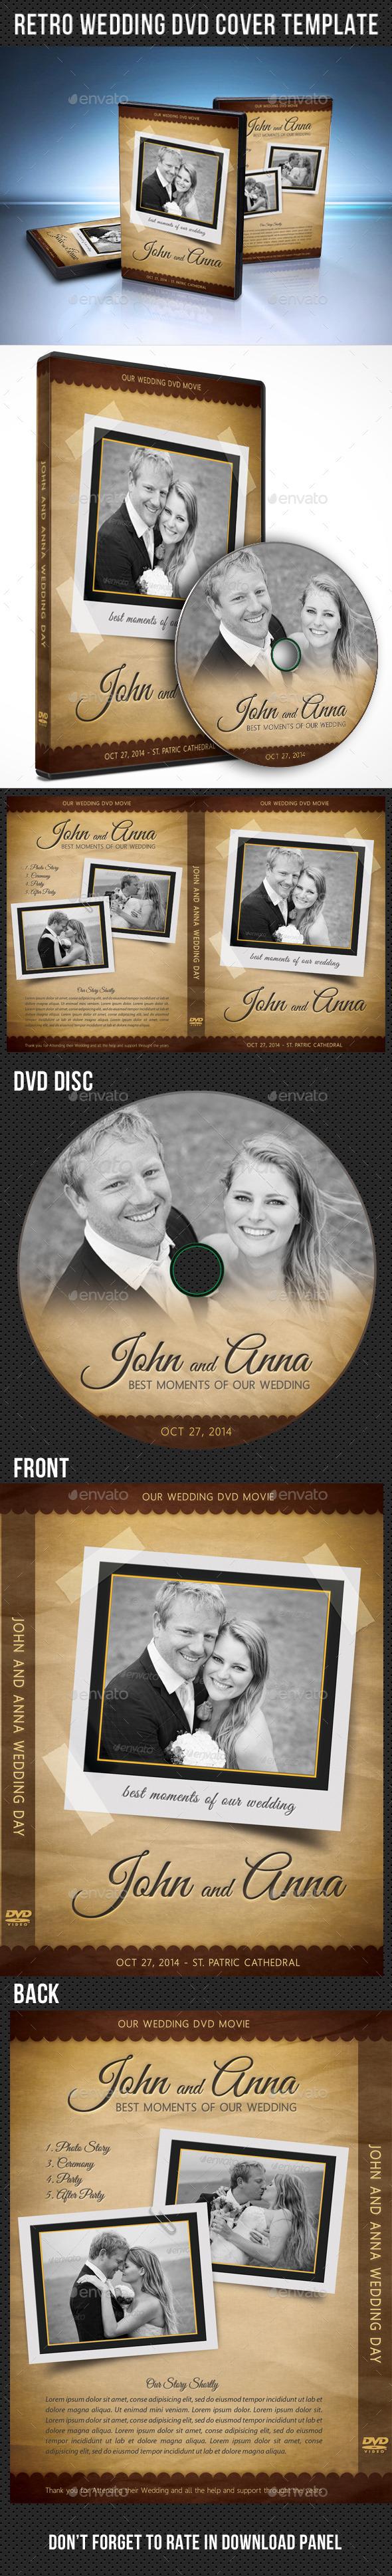 Retro Wedding DVD Cover Template 03 - CD & DVD Artwork Print Templates